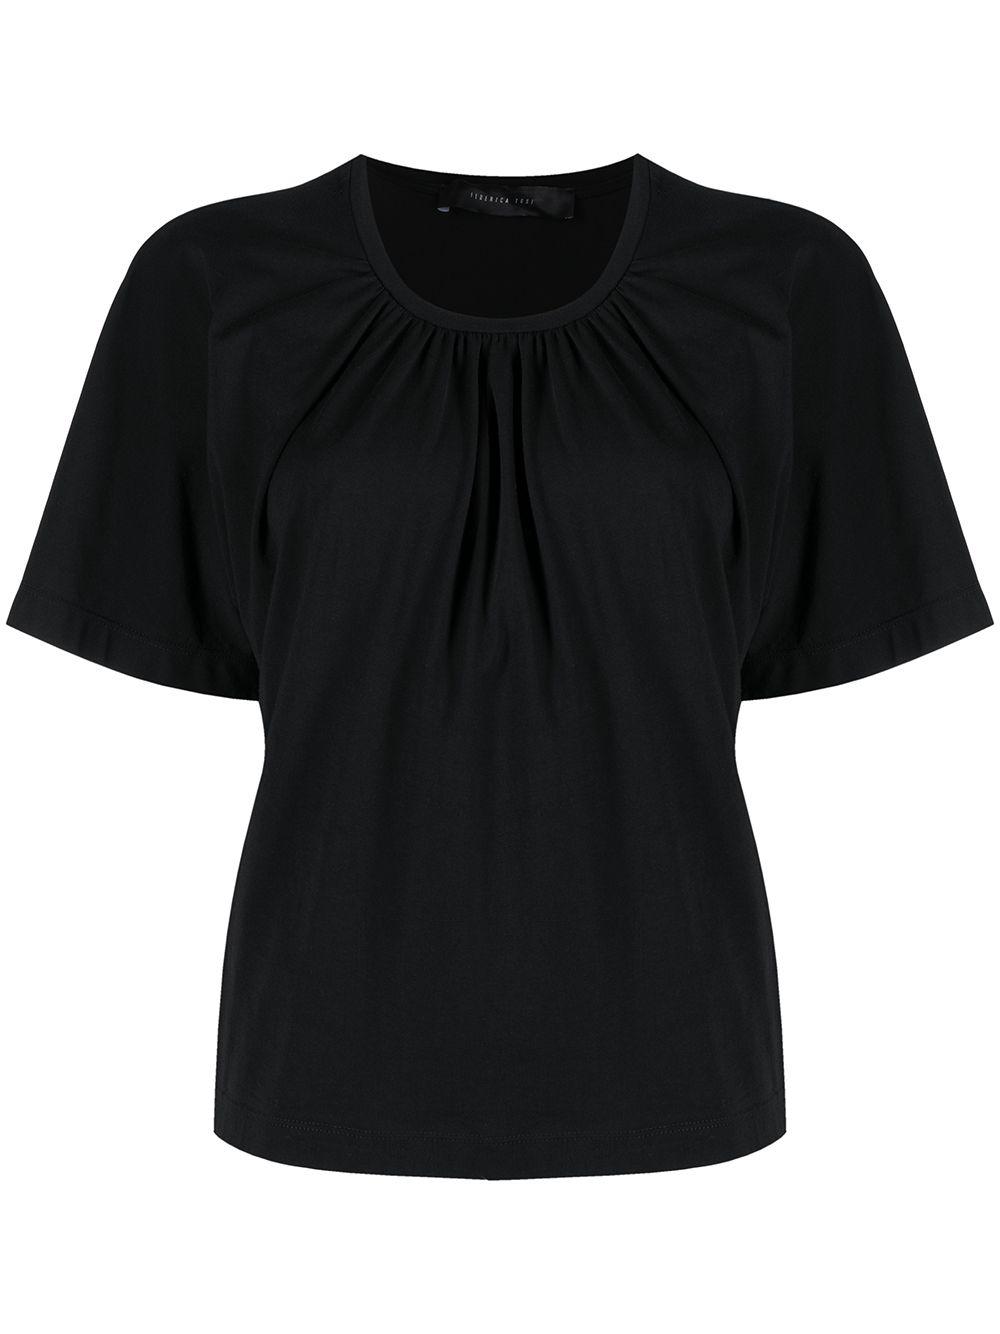 T-shirt girocollo FEDERICA TOSI   T-shirt   FTE21TS030.0JE00810002